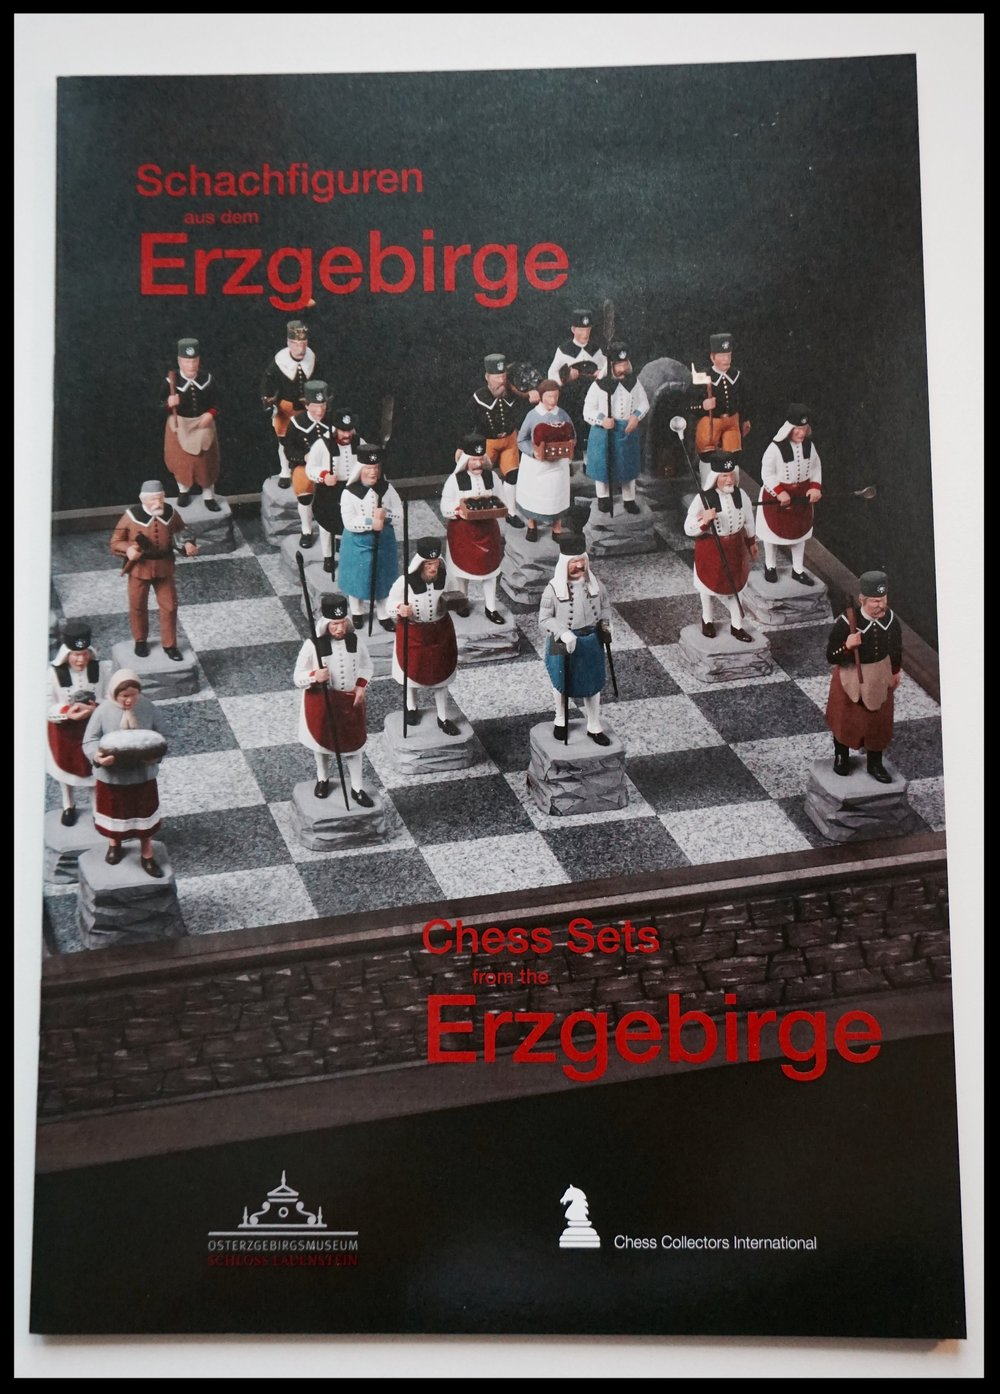 Schachfiguren aus dem Erzgebirge, Chess Collectors International 2012